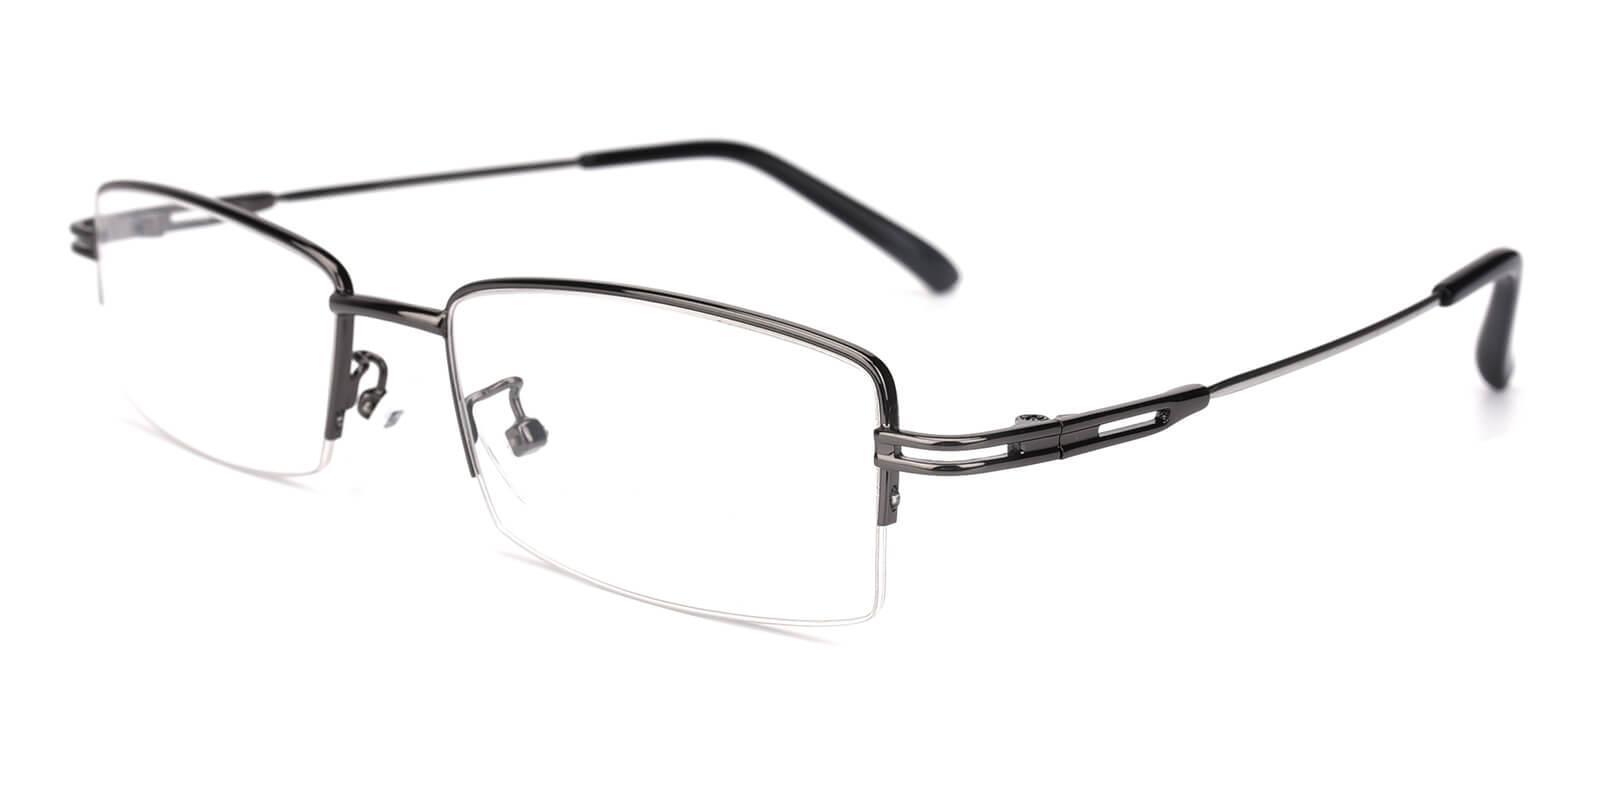 Studio-Gun-Rectangle-Metal-Eyeglasses-additional1